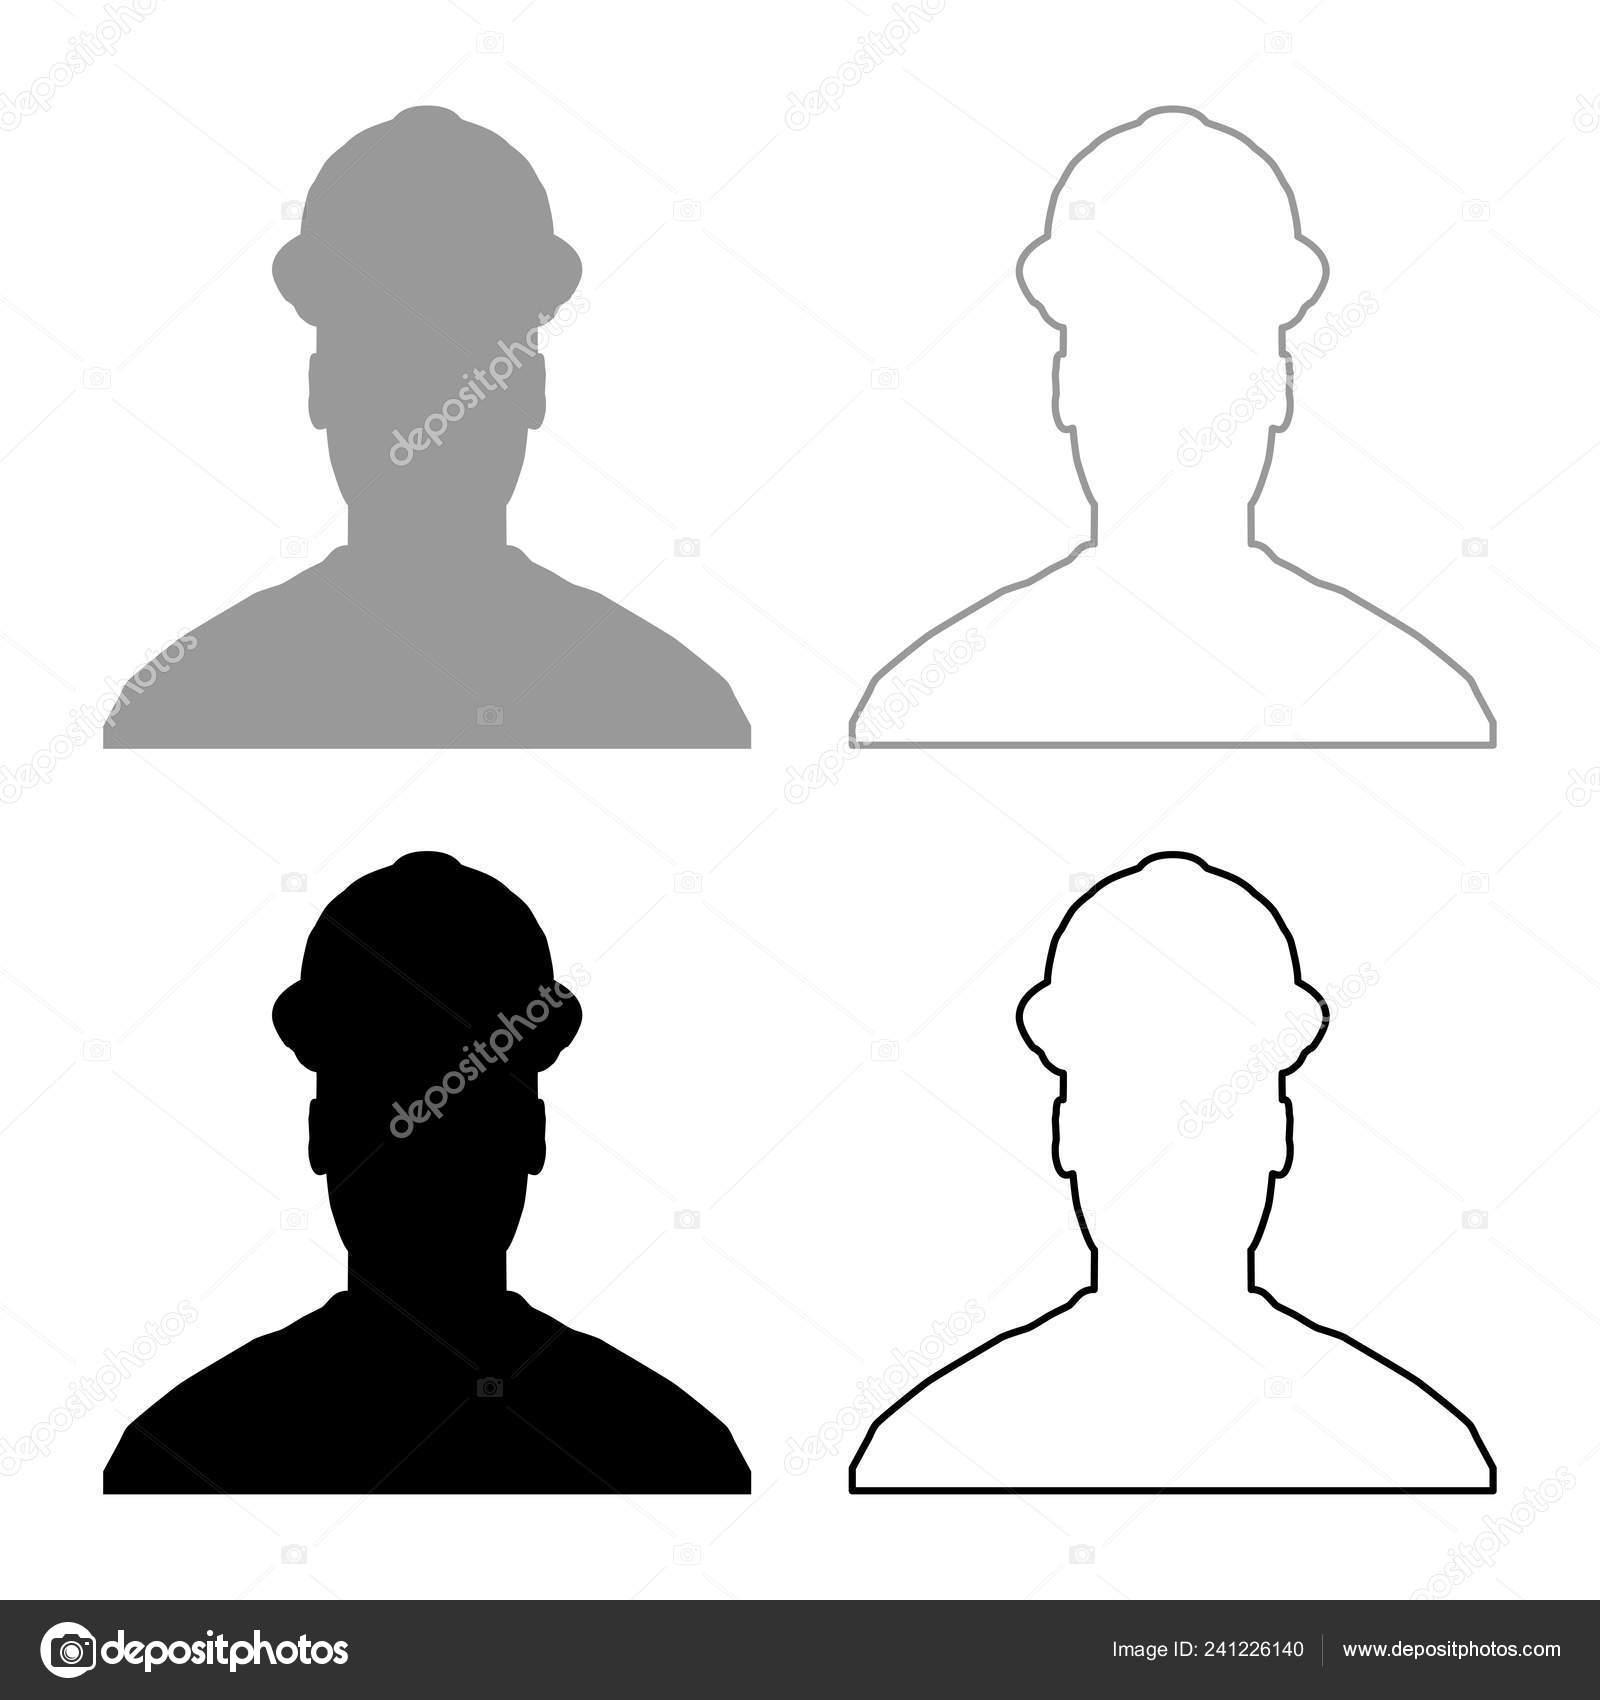 Avatare bilder